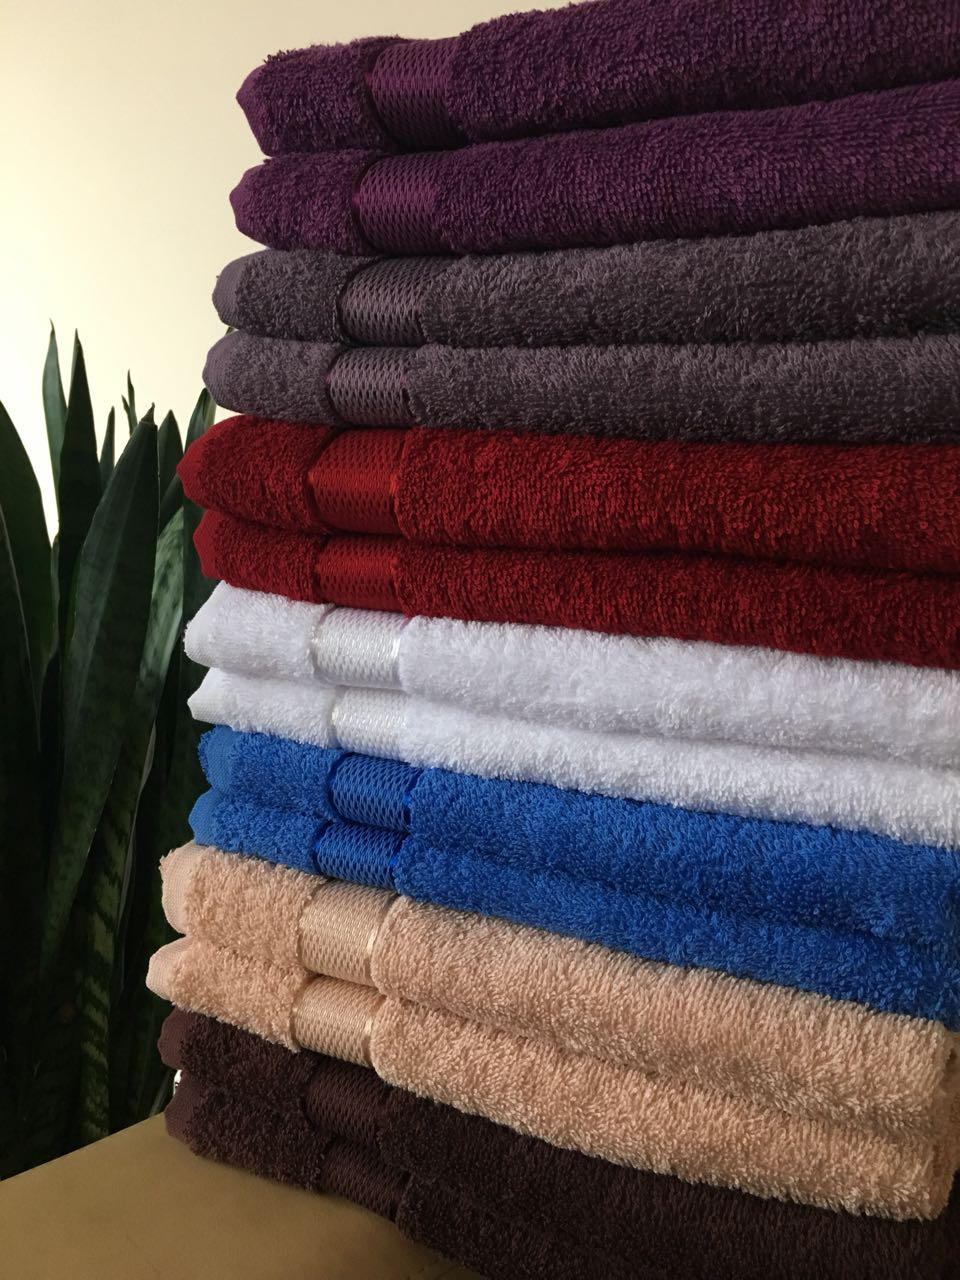 Махровое банное полотенце 70х140, плотность 400гр